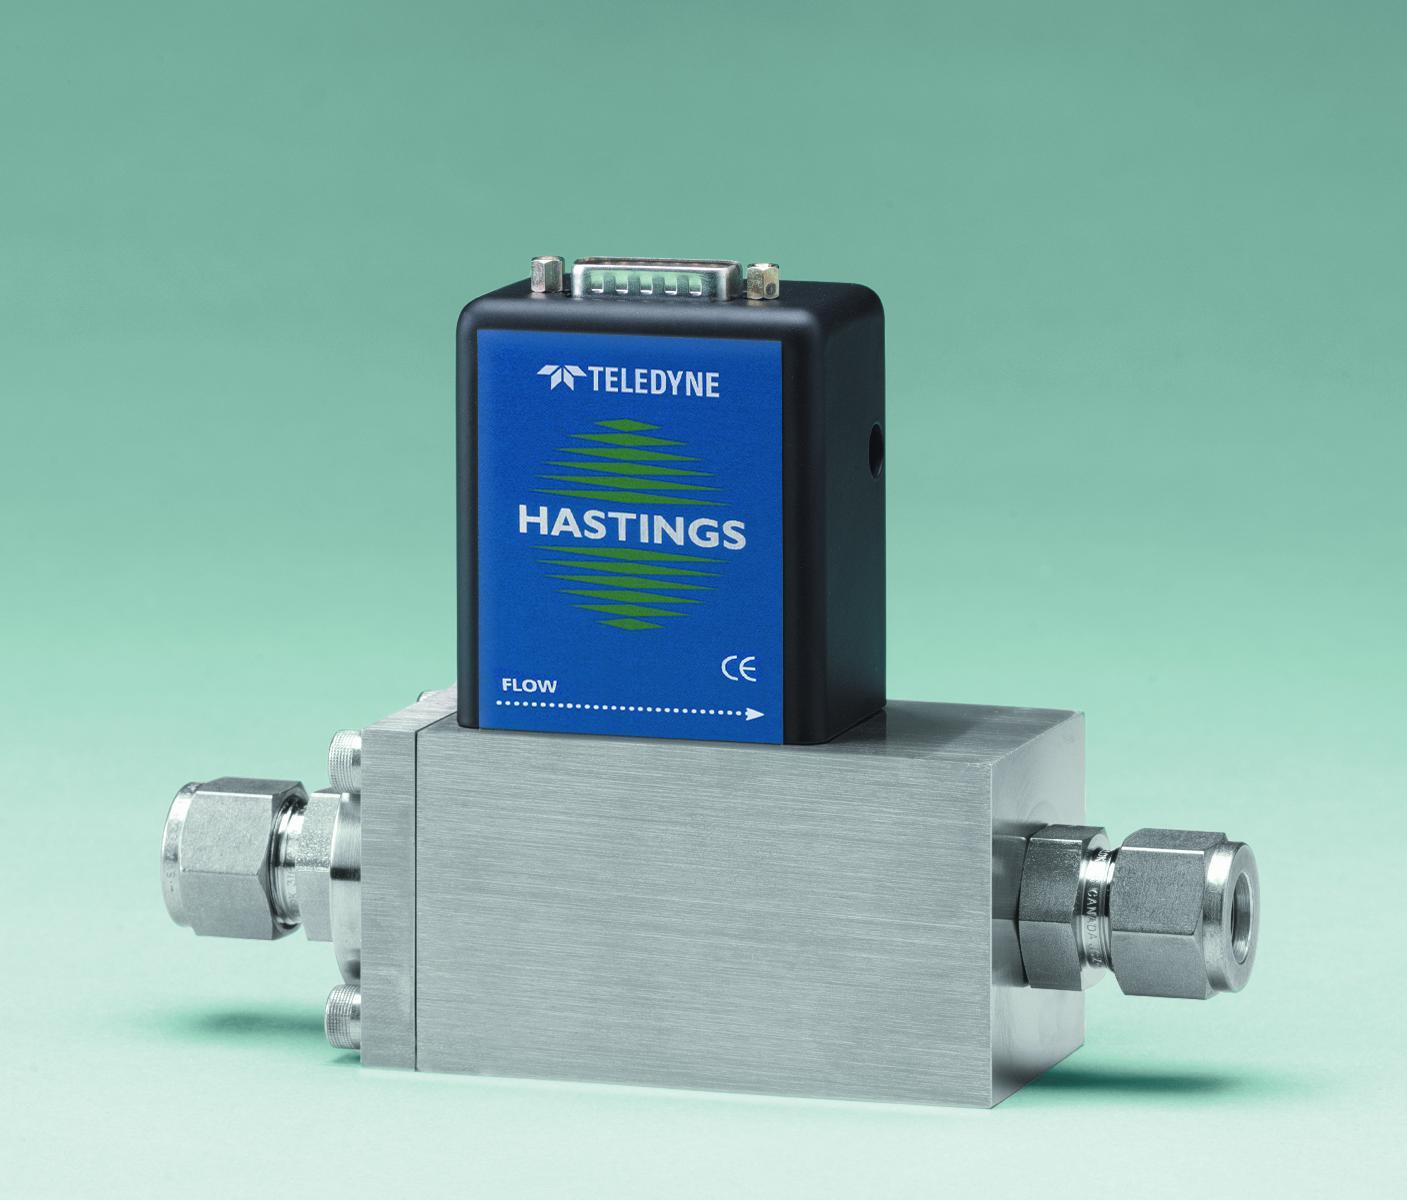 HFM-301 Mass Flow Meter